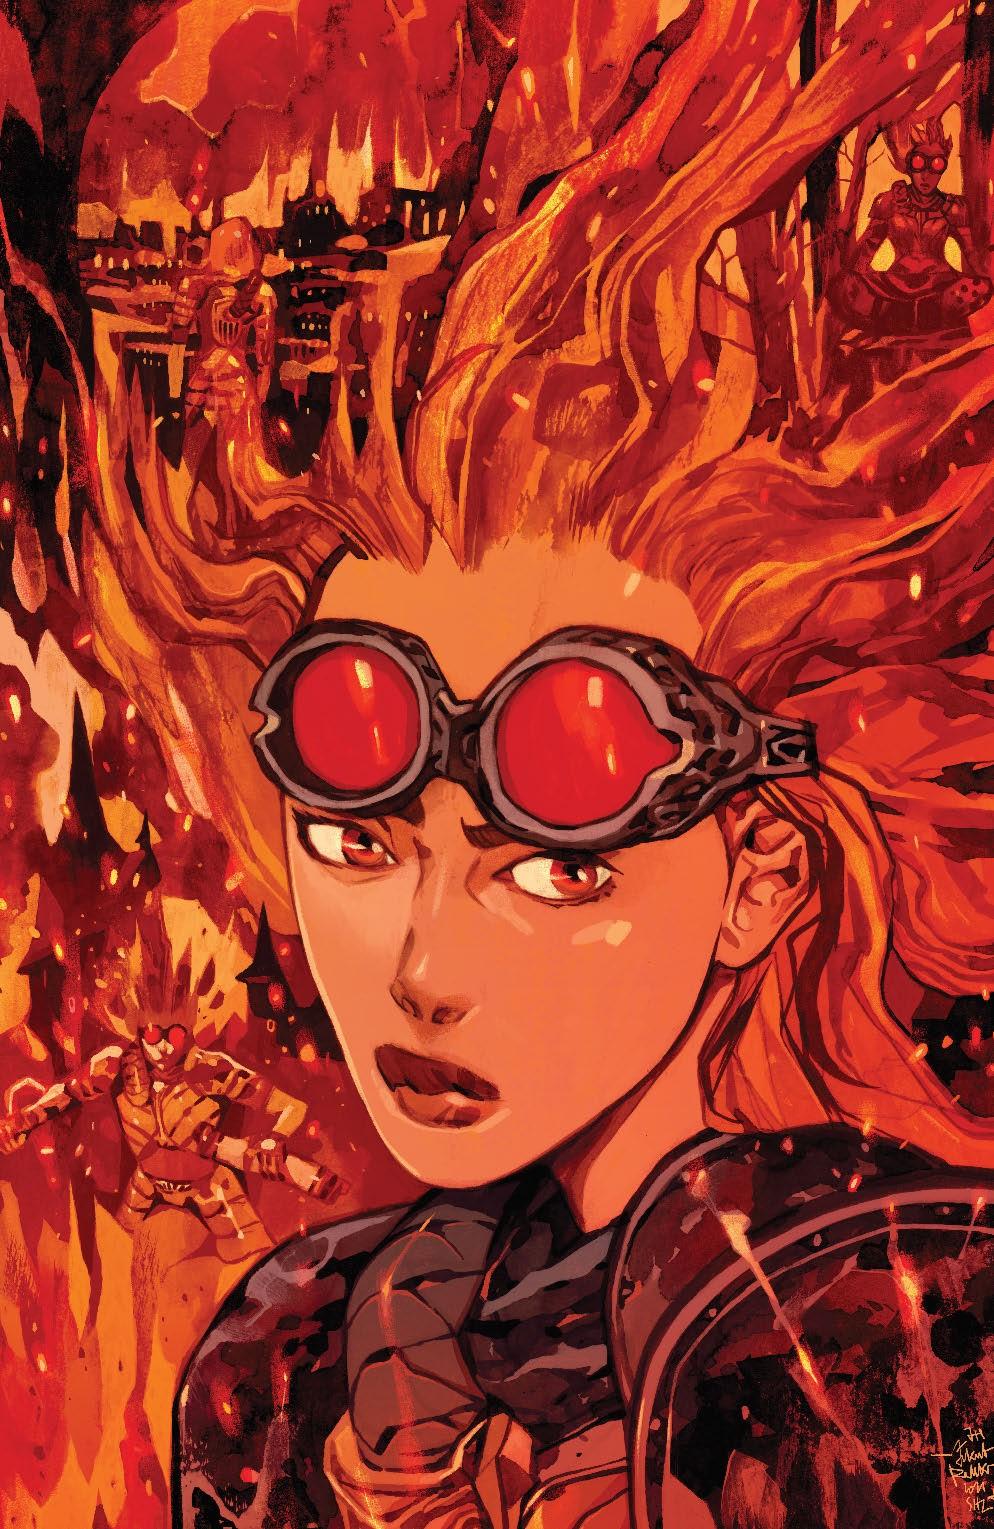 Magic_007_Cover_C3_HiddenSpark ComicList: BOOM! Studios New Releases for 10/06/2021